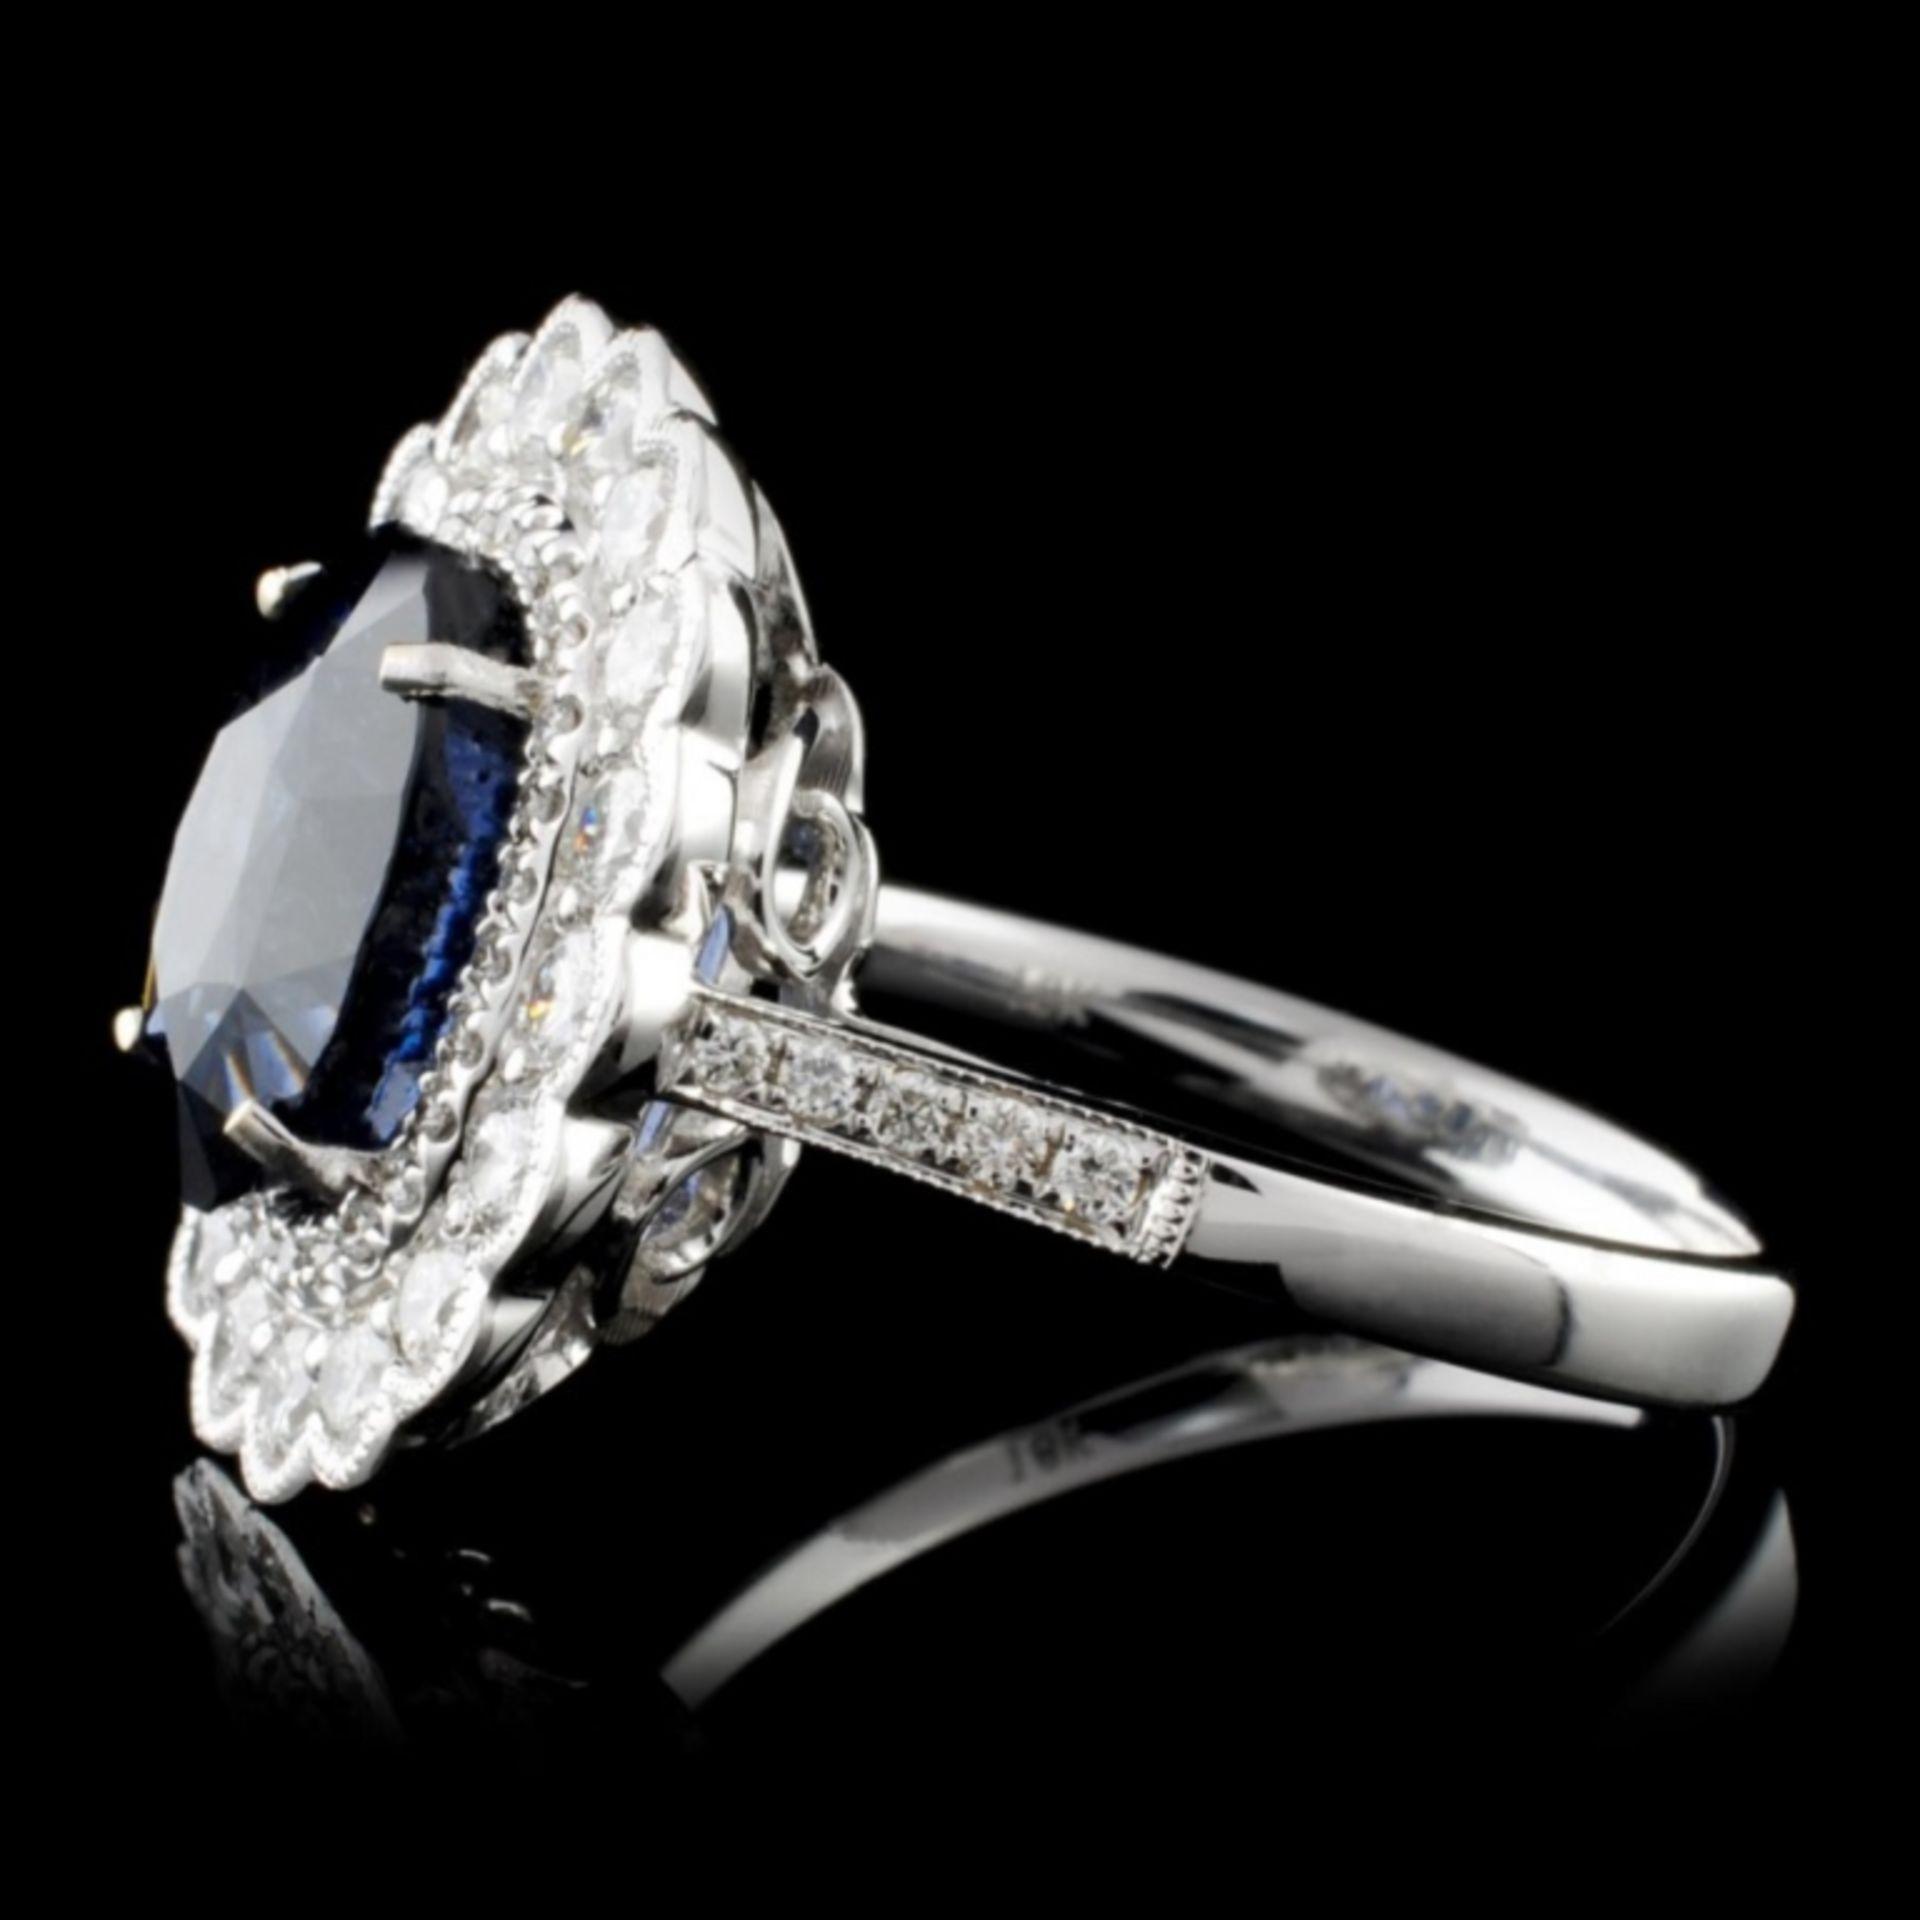 18K White Gold 3.52ct Spinel & 0.78ct Diamond Ring - Image 3 of 4